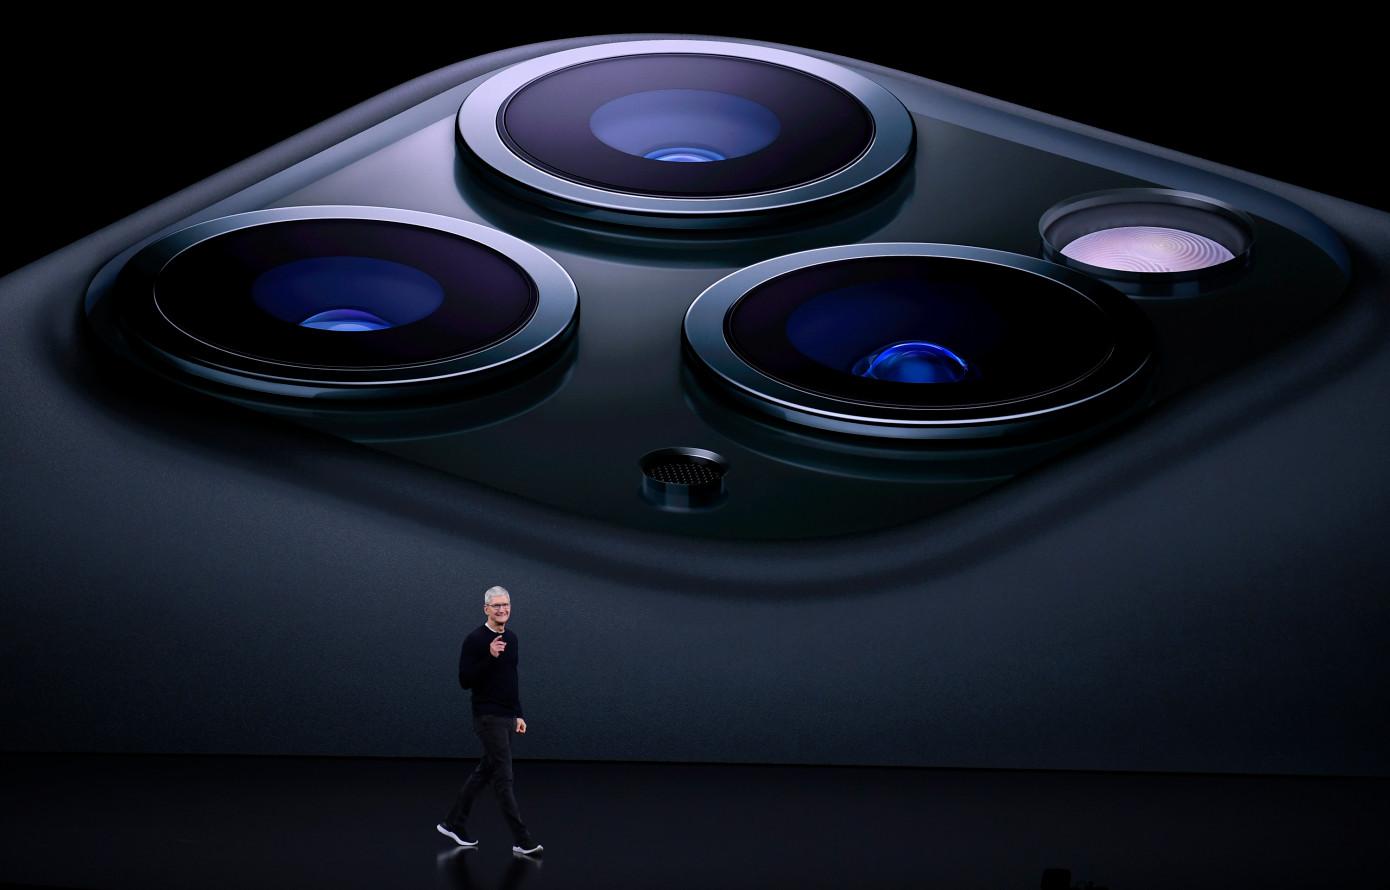 apple diz criar novo iphone baseado no design do ipad pro designe